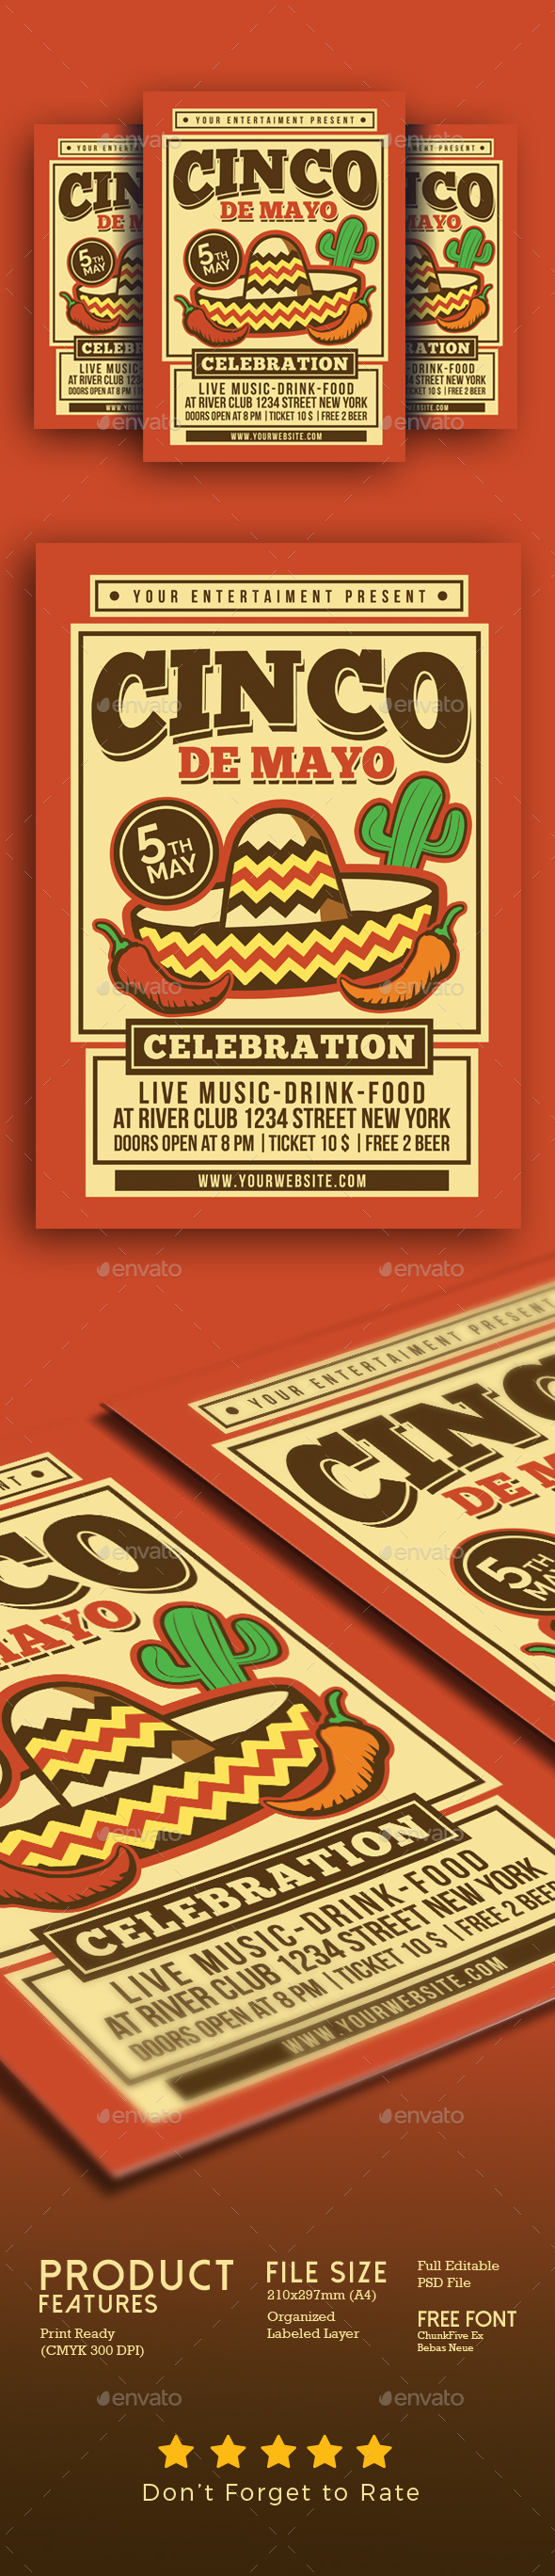 Cinco De Mayo Celebration Flyer - Events Flyers